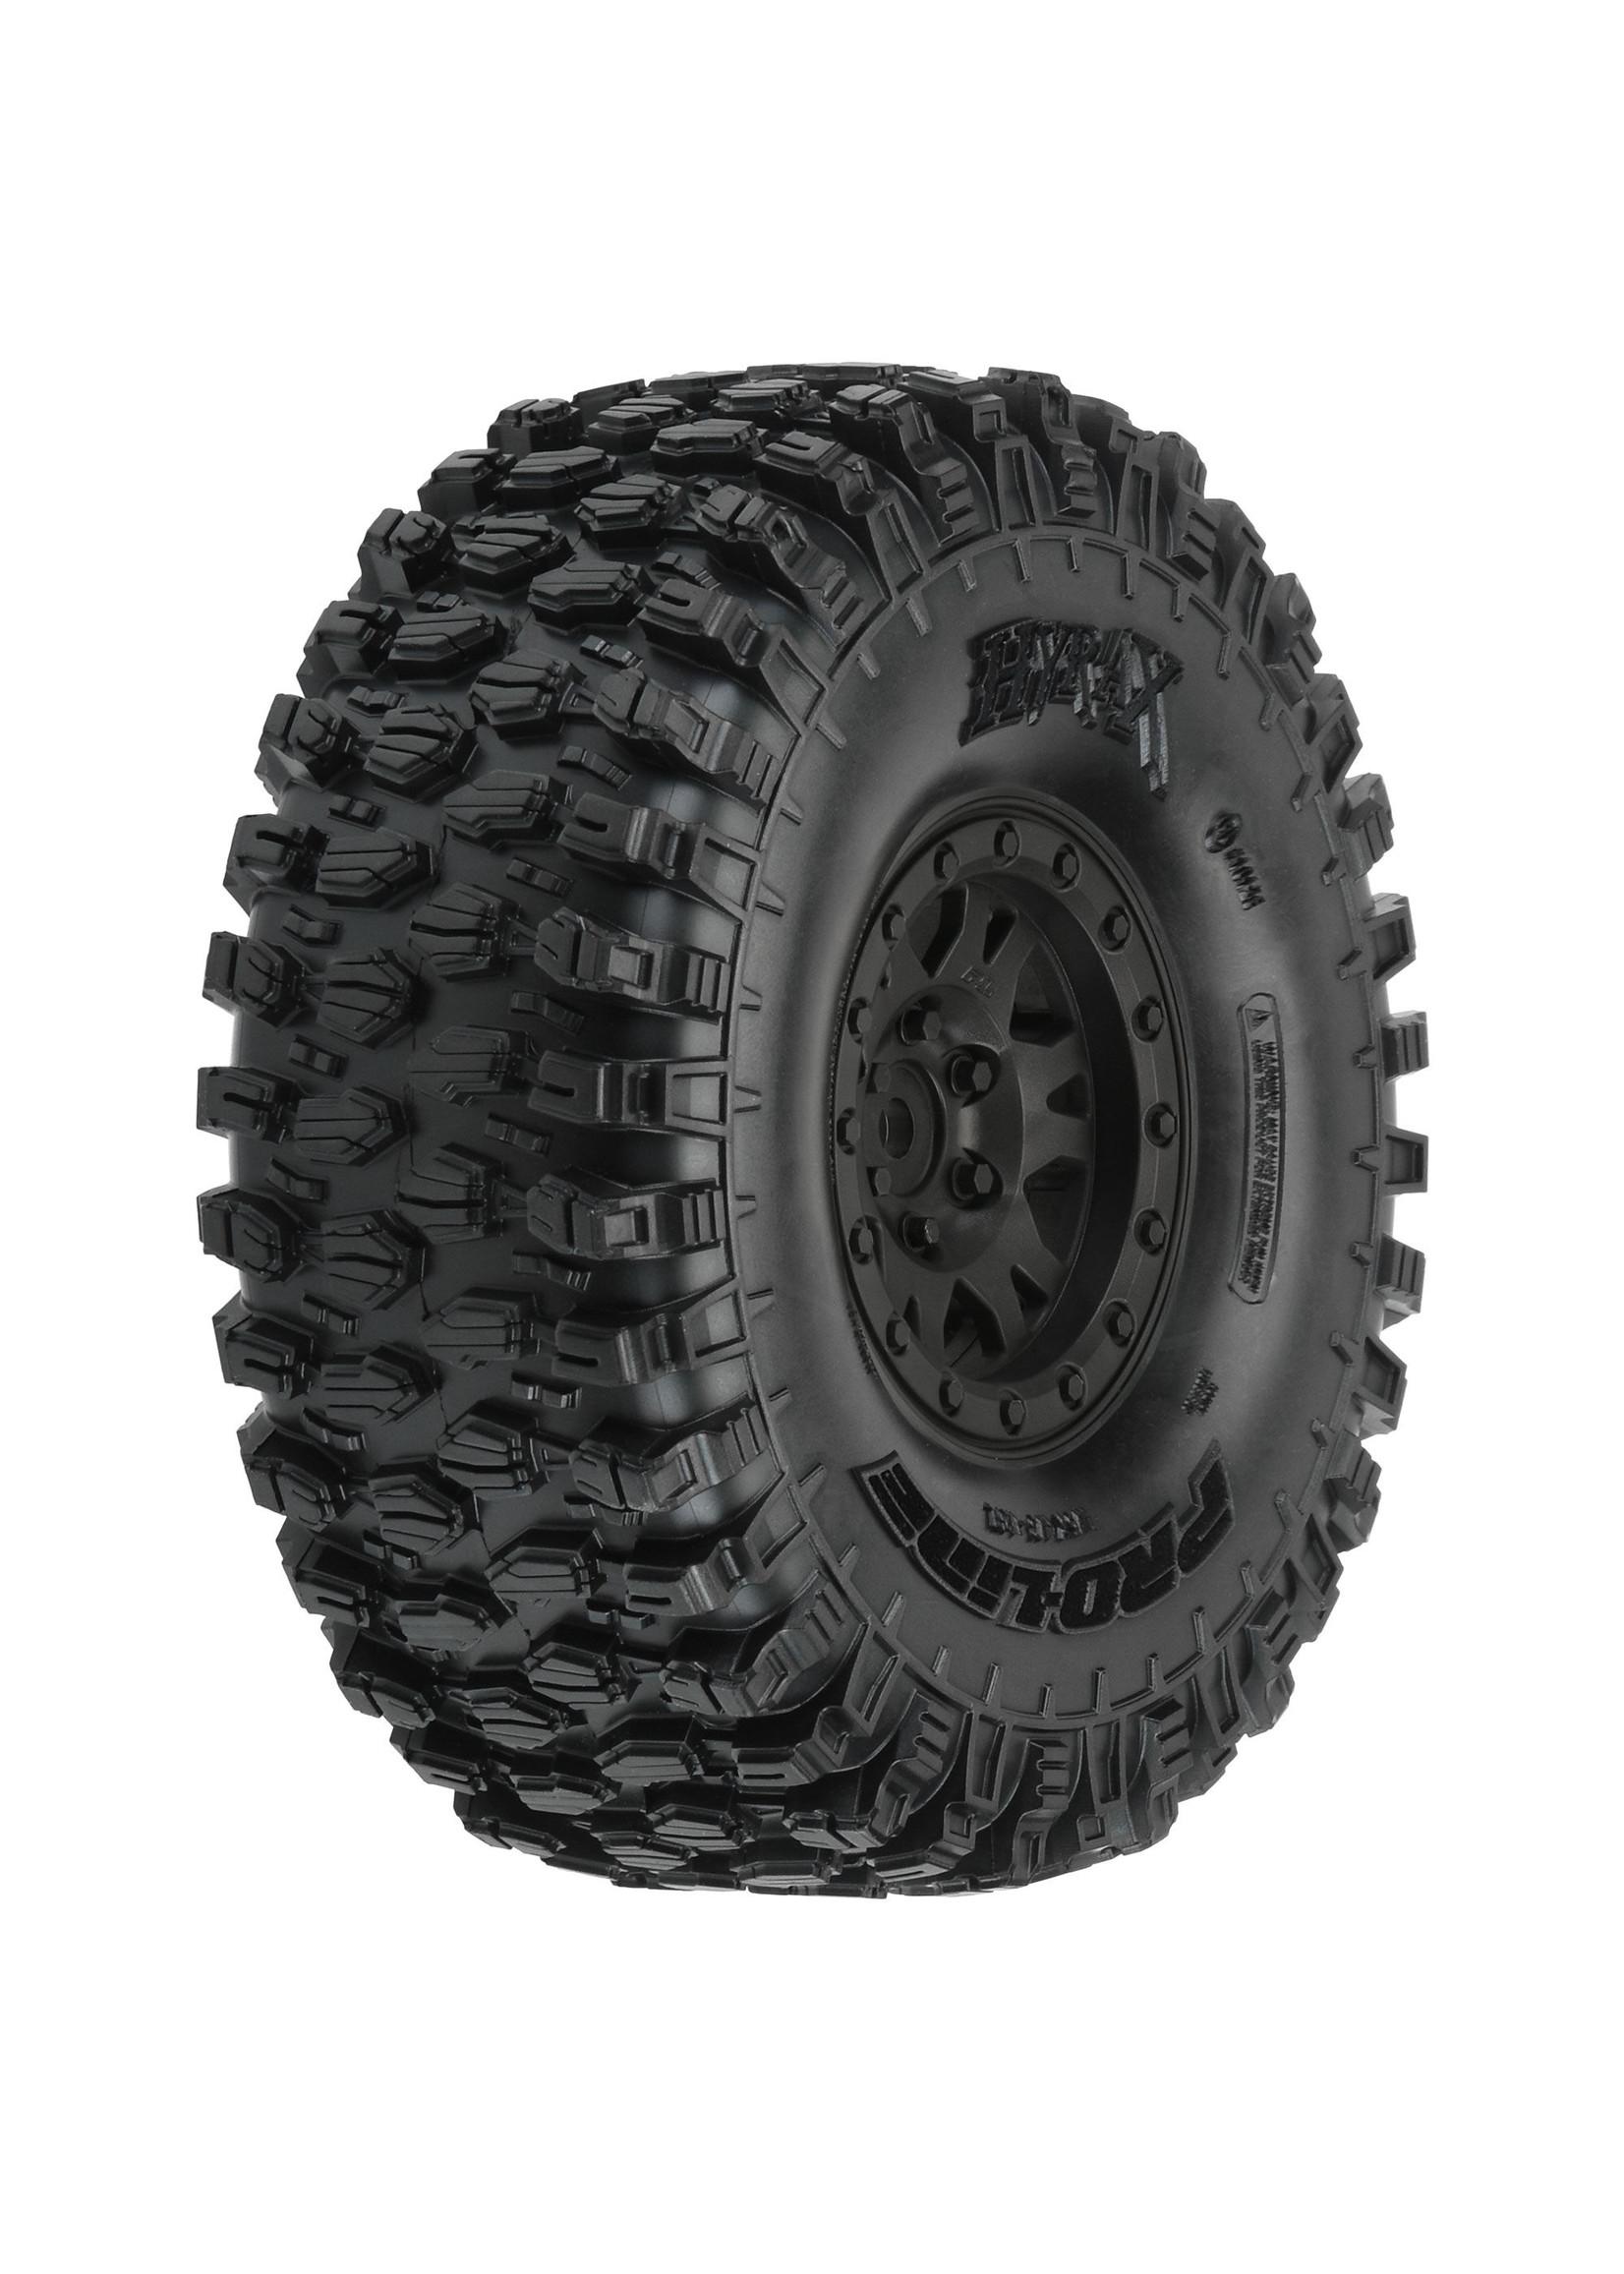 Pro-Line Racing PRO1012810 Pro-Line Hyrax 1.9 G8 Mtd Impulse Black Whls (2)